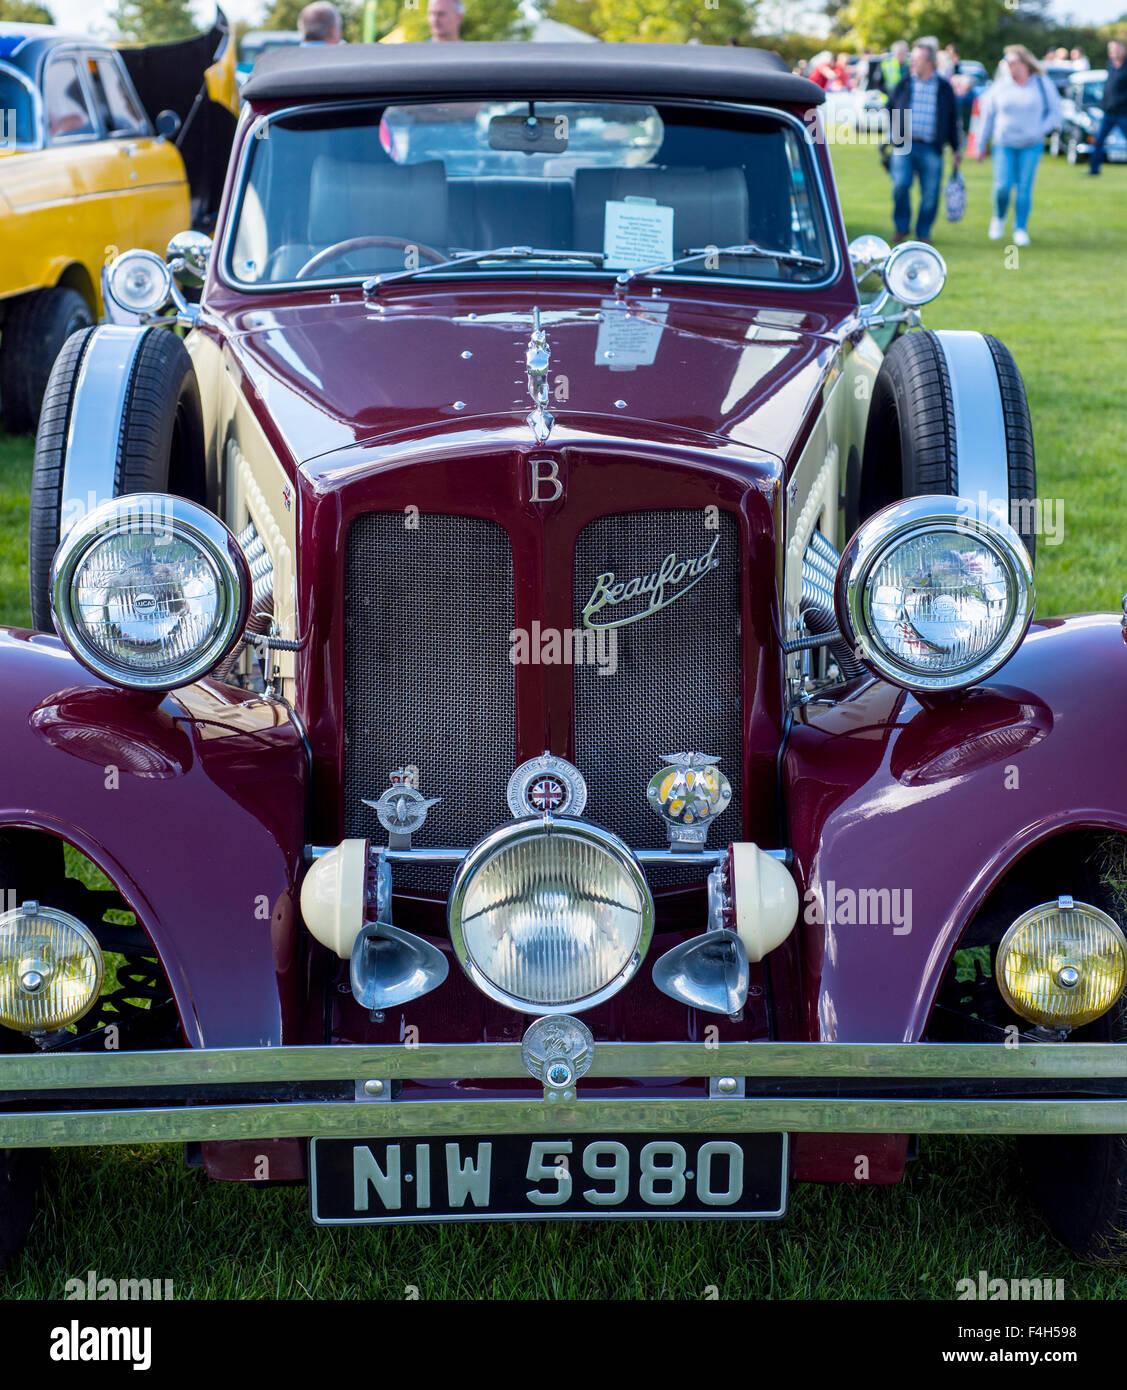 Beauford car, with emblem, headlamps, grille, bonnet, hood, windscreen, spare tires, bumper, purple, silver, badges, - Stock Image